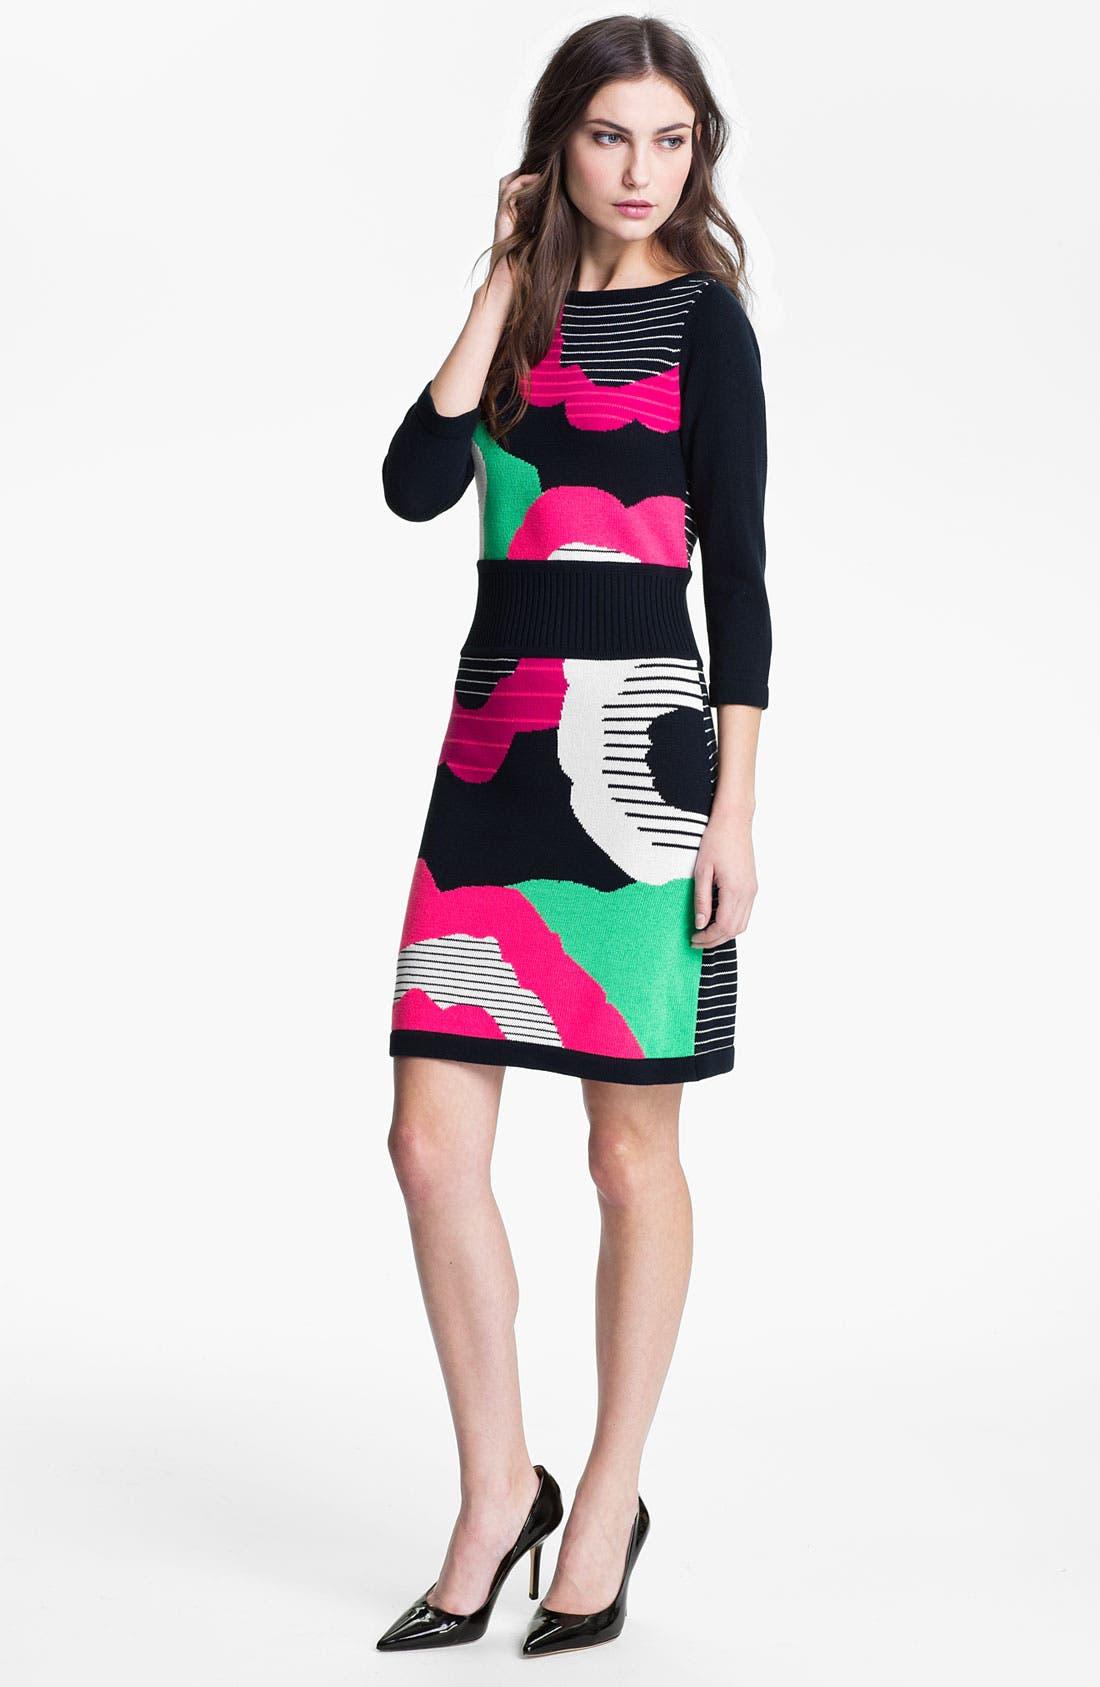 Alternate Image 1 Selected - Nanette Lepore 'Cartoonist' Cotton Blend Sweater Dress